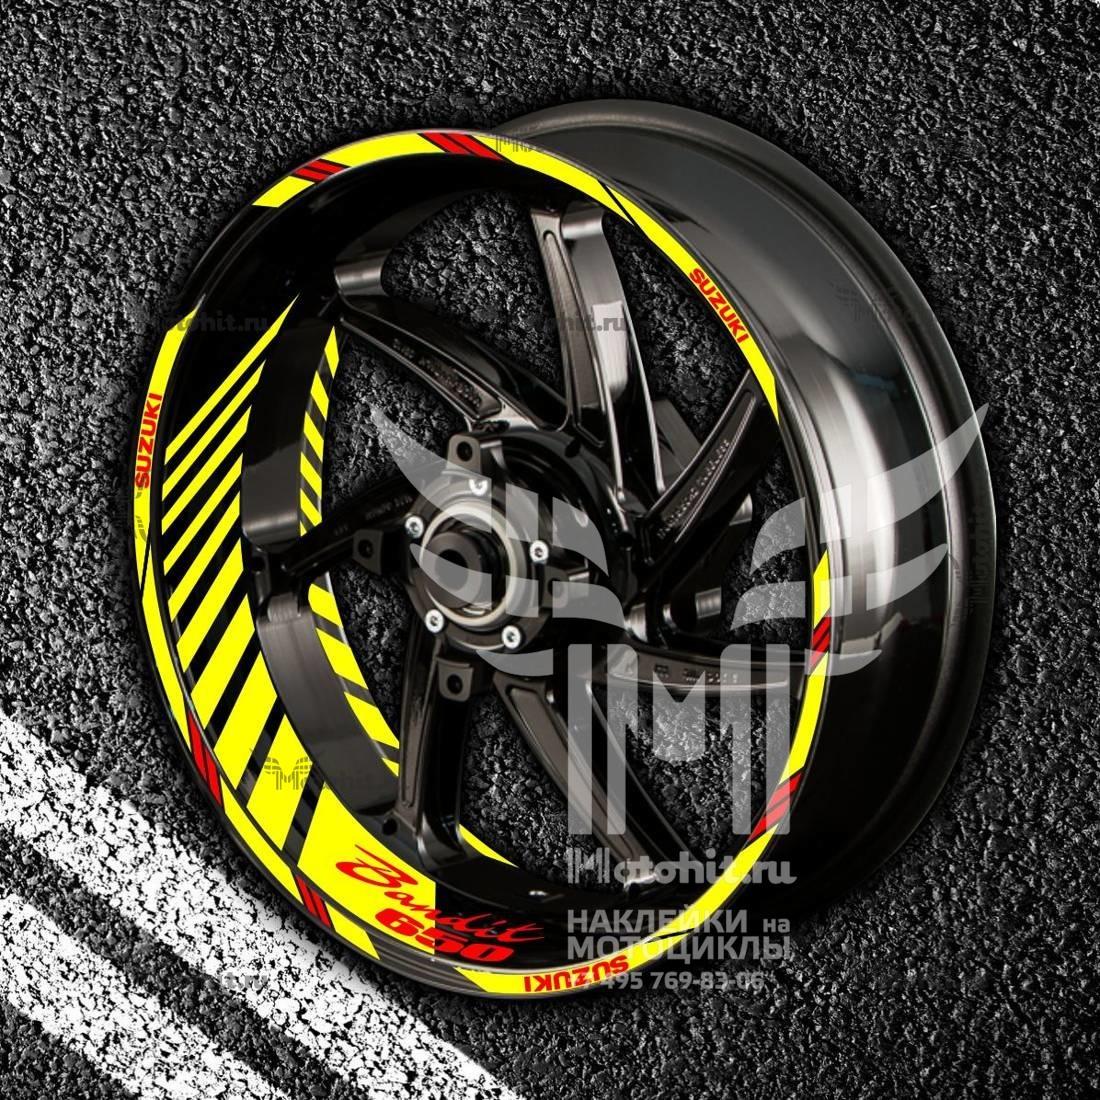 Комплект наклеек с полосами на колеса мотоцикла SUZUKI BANDIT-650